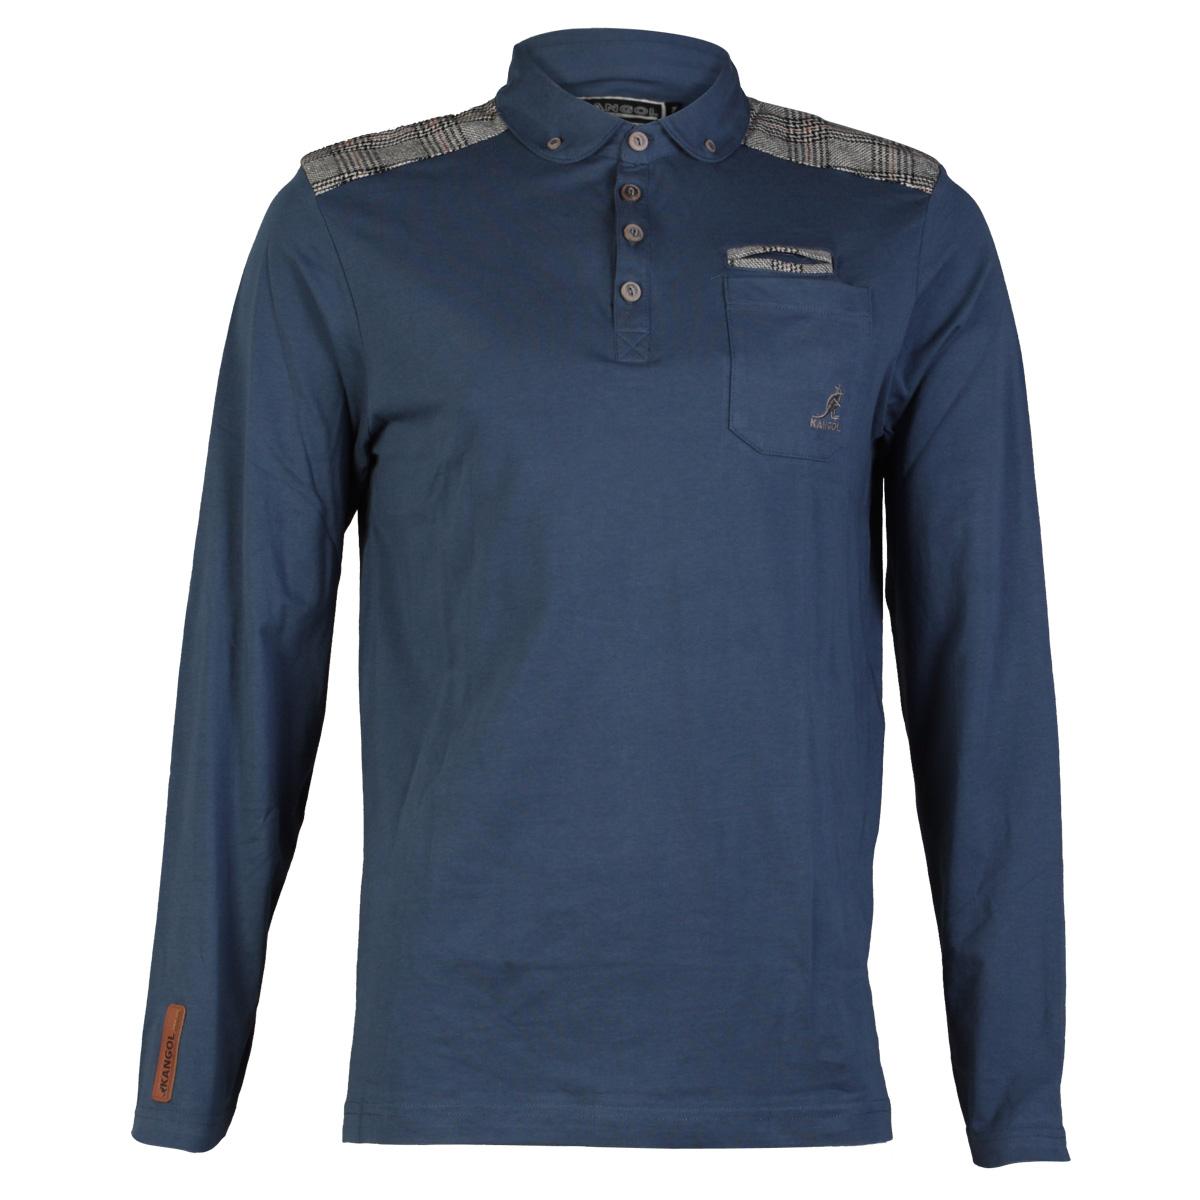 New Mens Kangol K606686c Designer Long Sleeved Tweed Polo